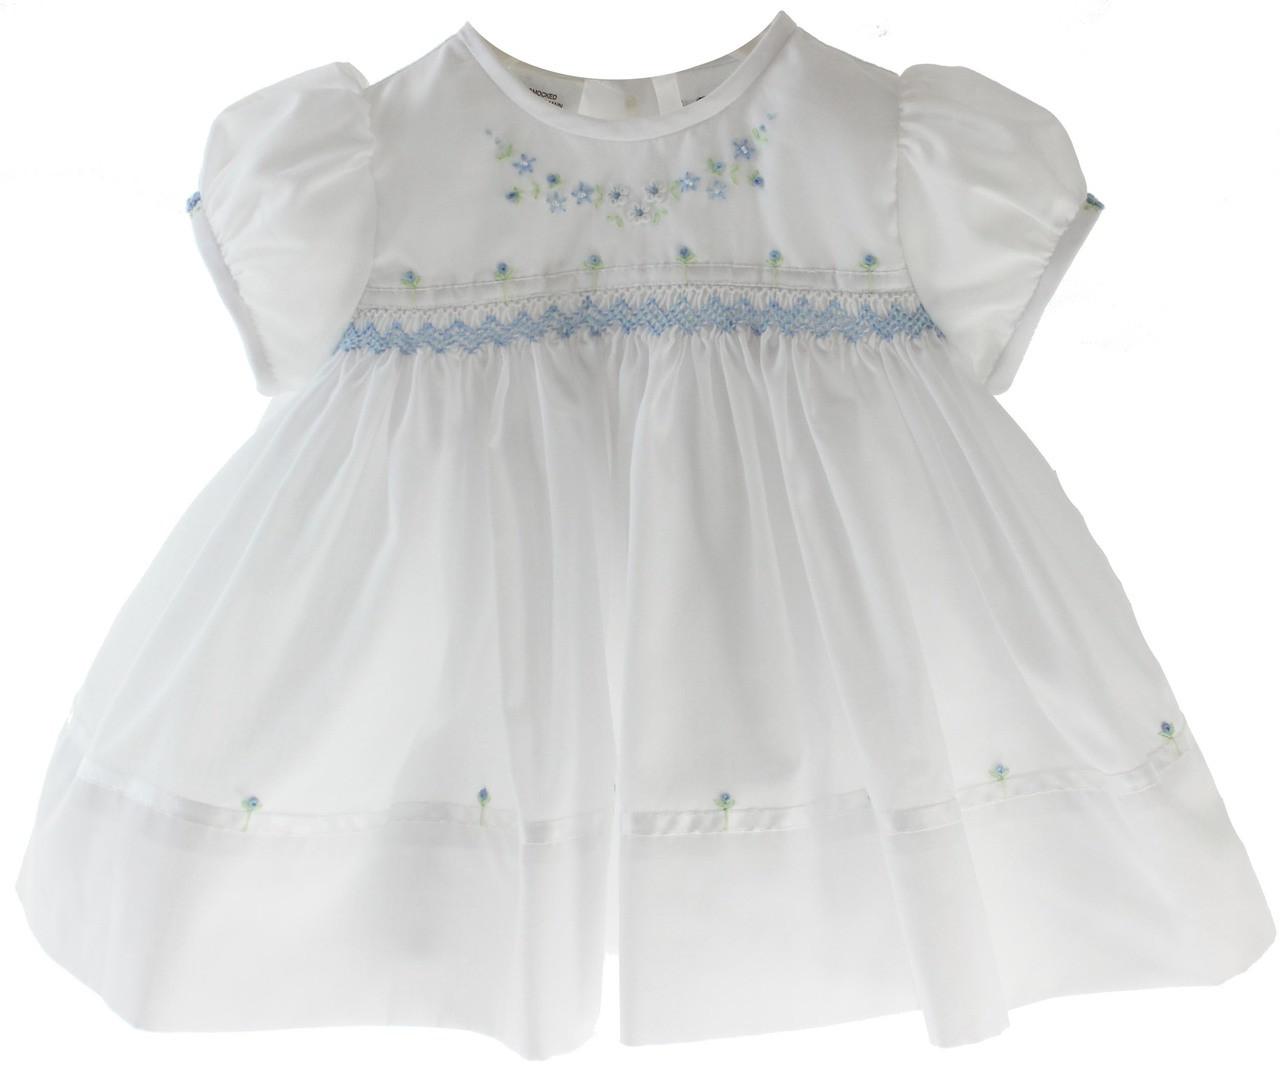 1d8615c018b ... Baby Girls White Dress Smocked in Blue | Sarah Louise. Loading zoom